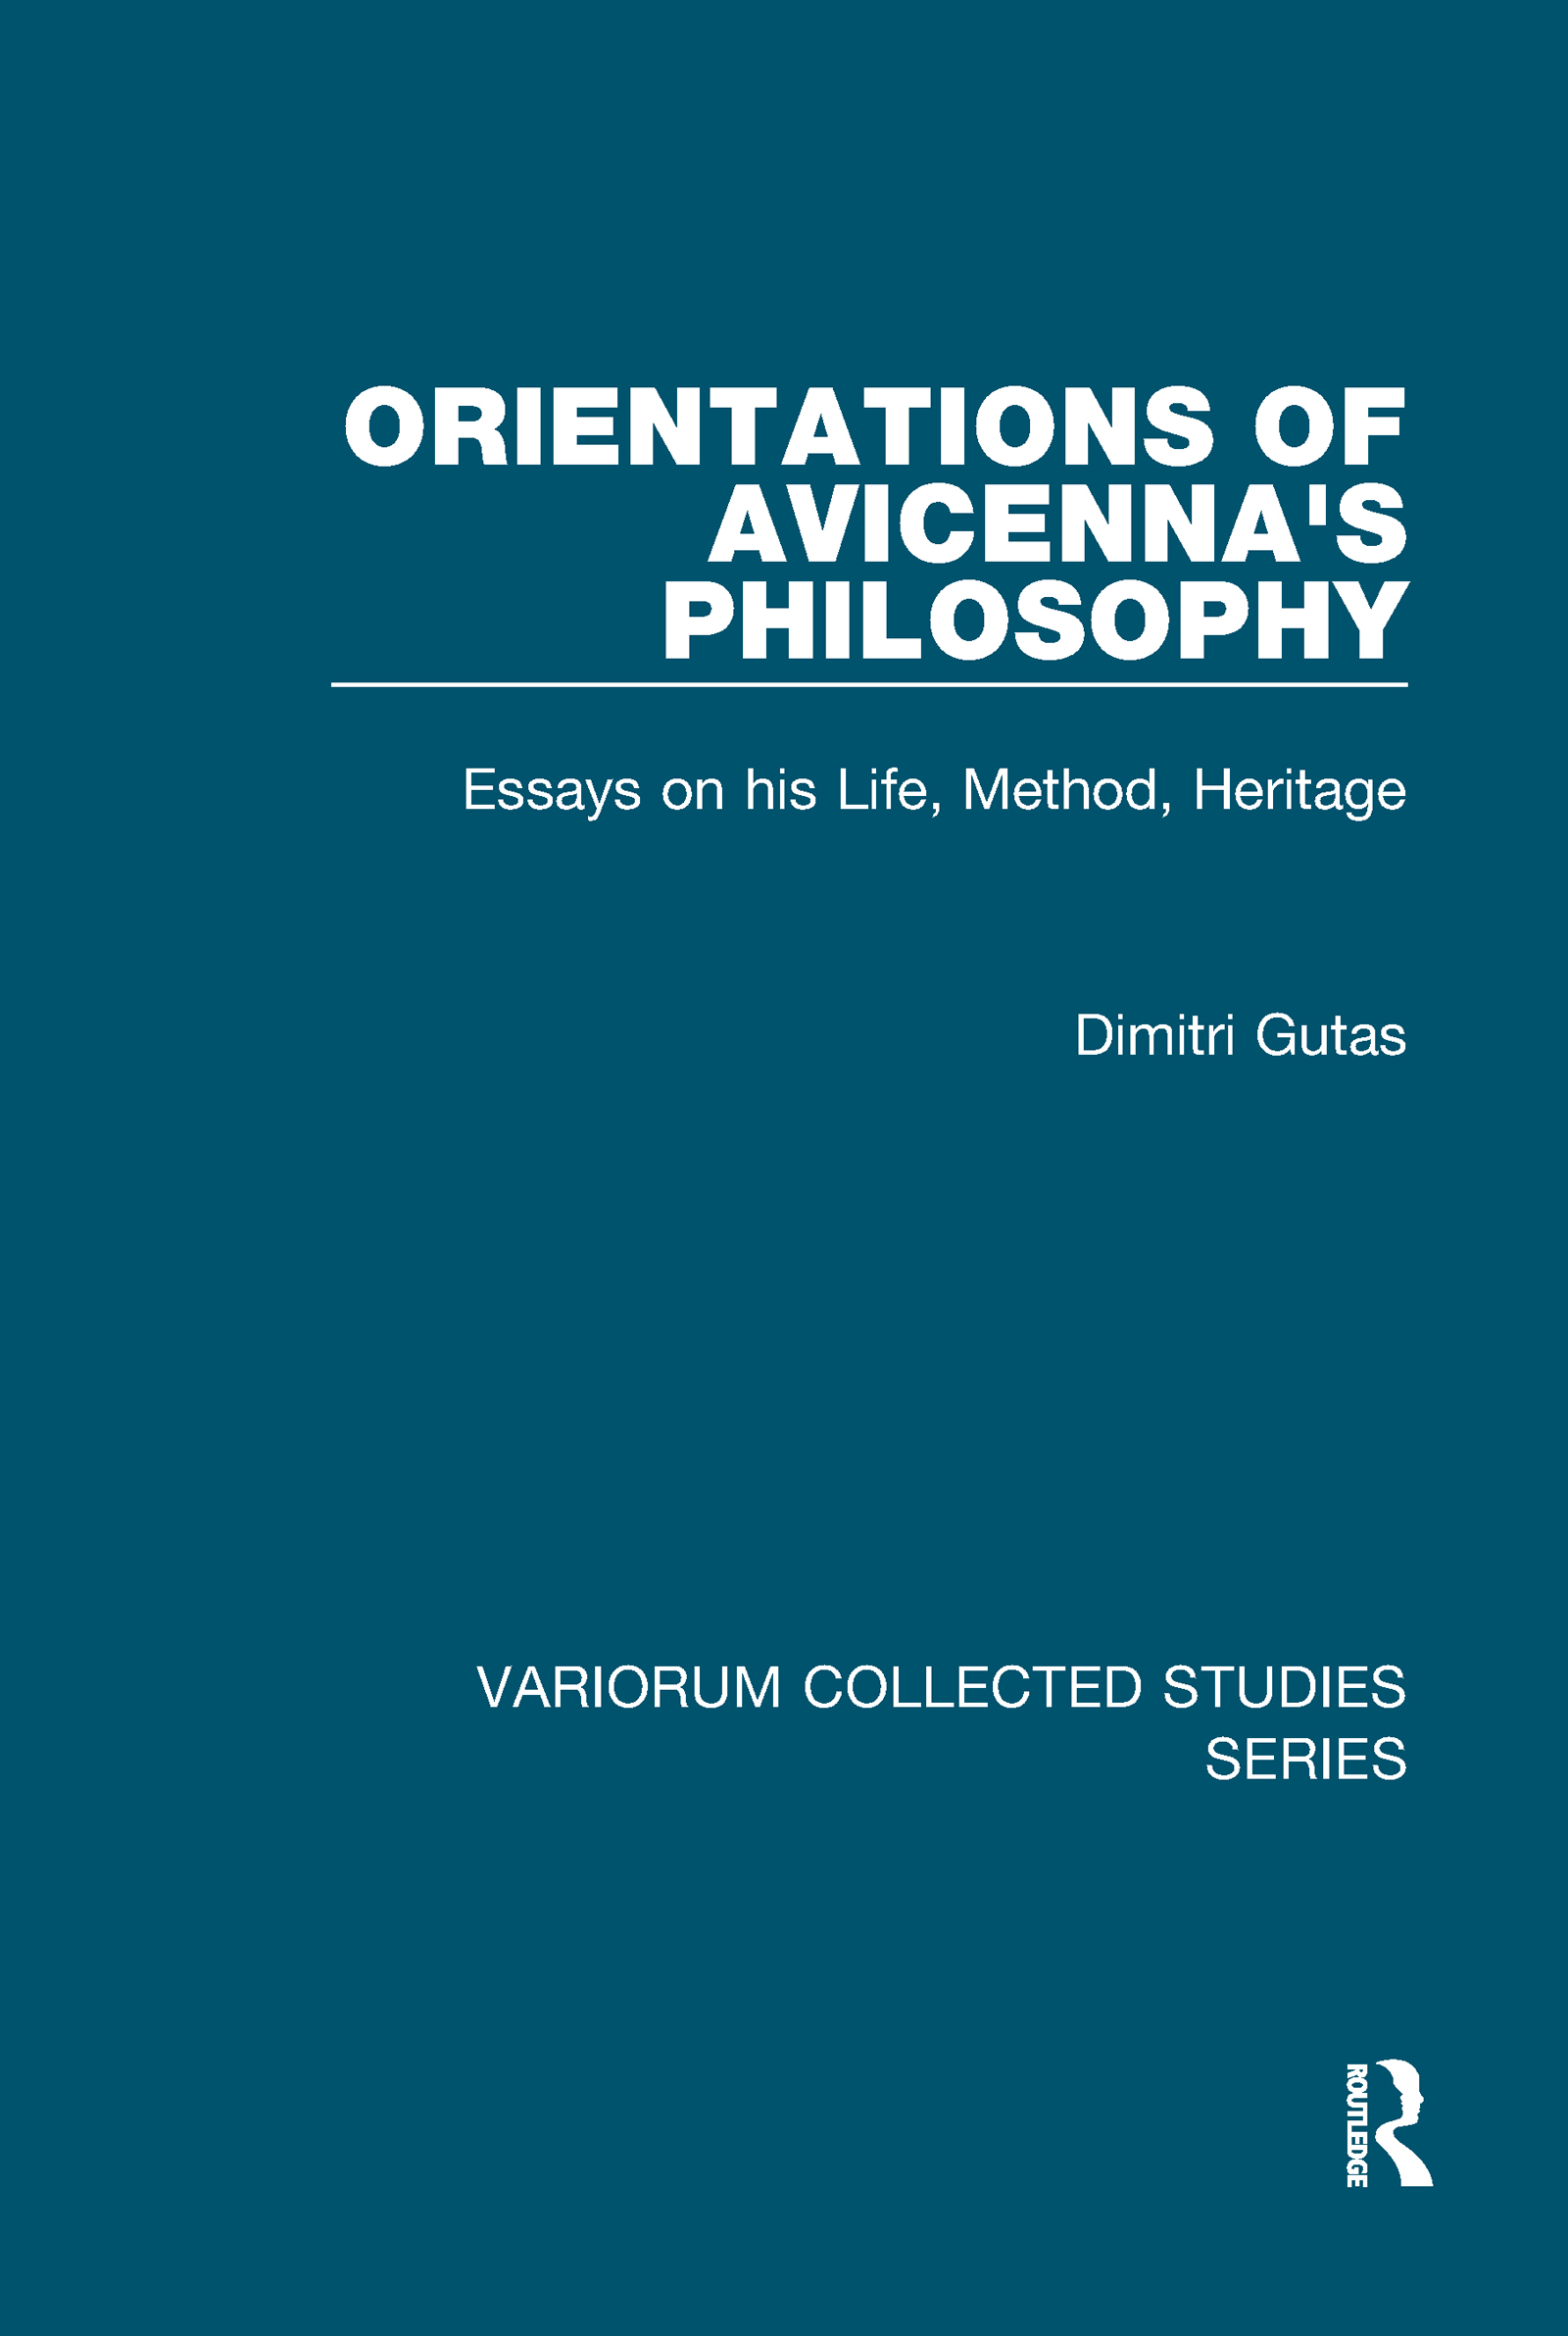 Orientations of Avicenna's Philosophy